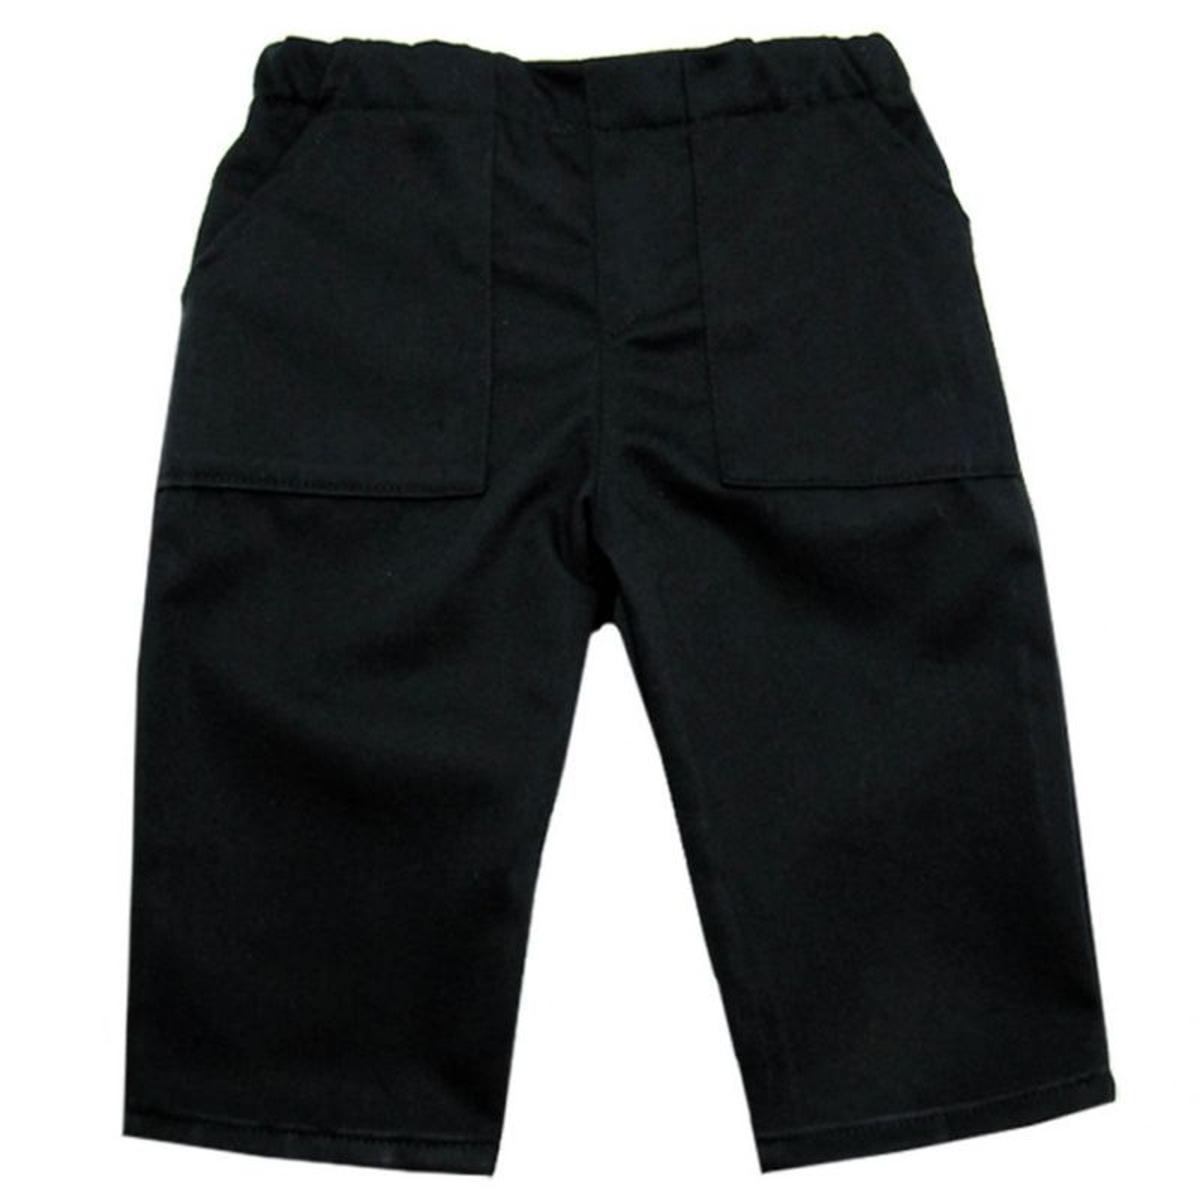 Pantalon uni deux poches 0 mois-10 ans Made in france